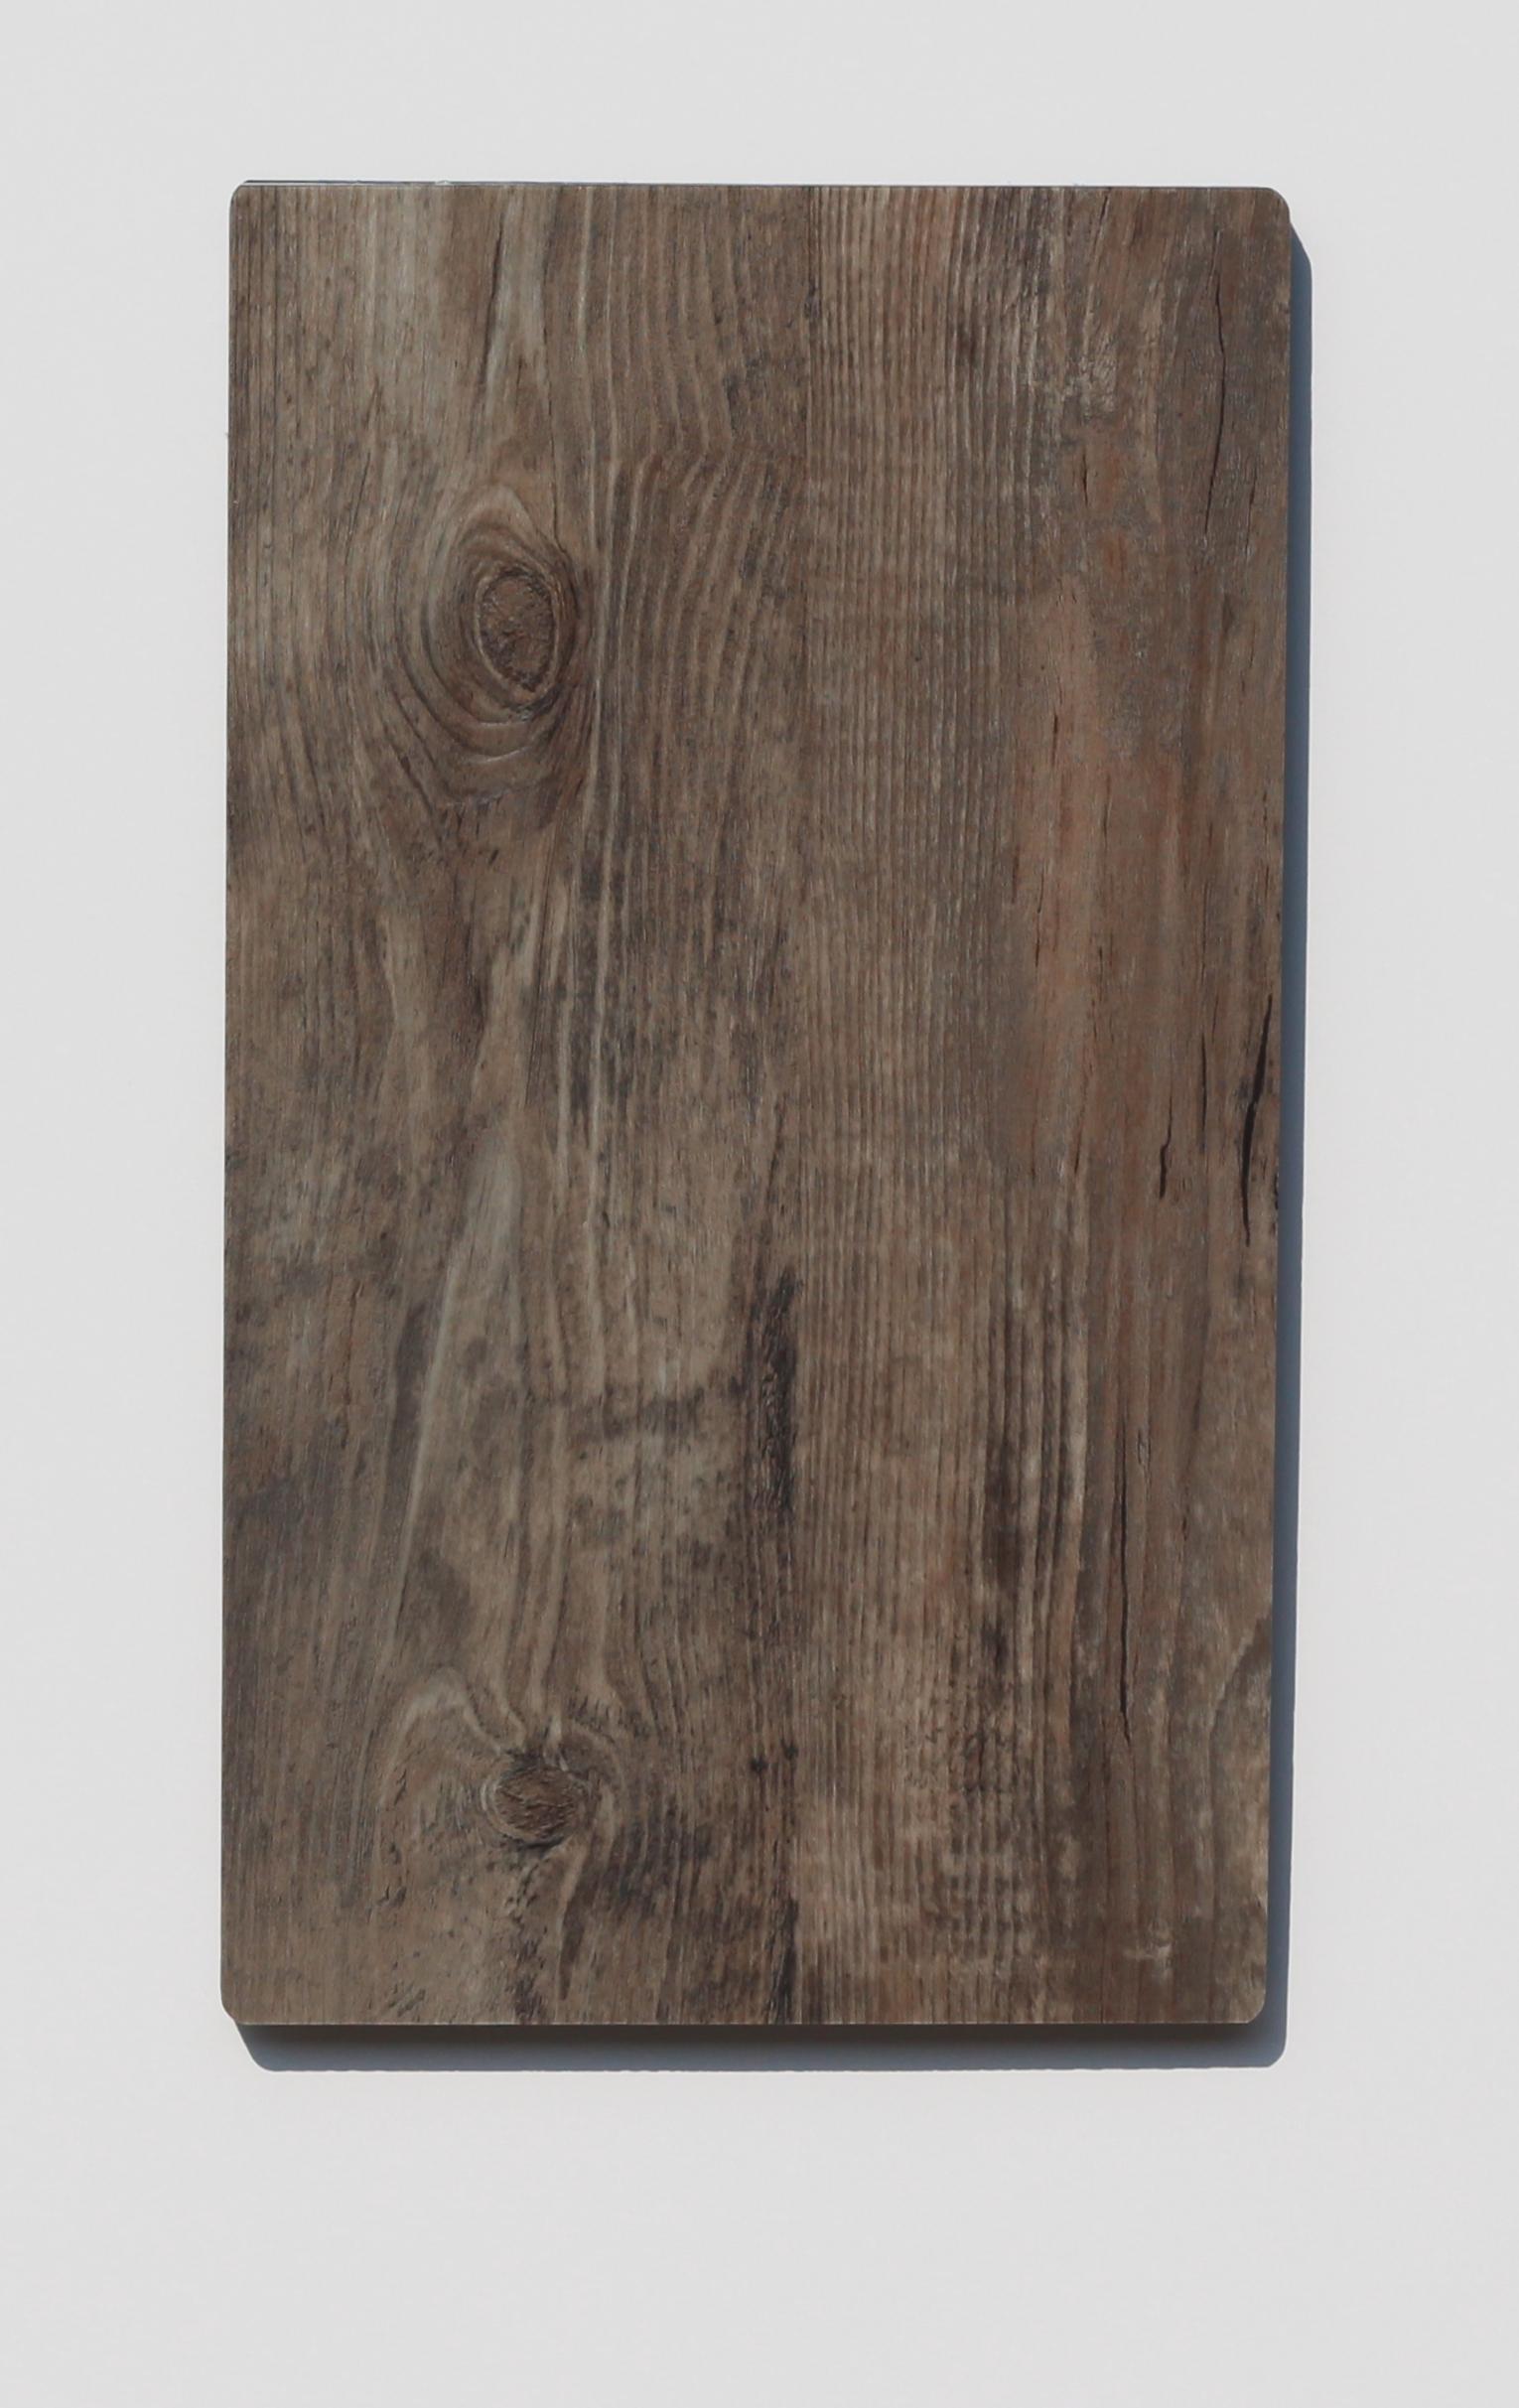 flux vinyl holz schl sselbrett in 22 5 x 40cm diamond 185. Black Bedroom Furniture Sets. Home Design Ideas